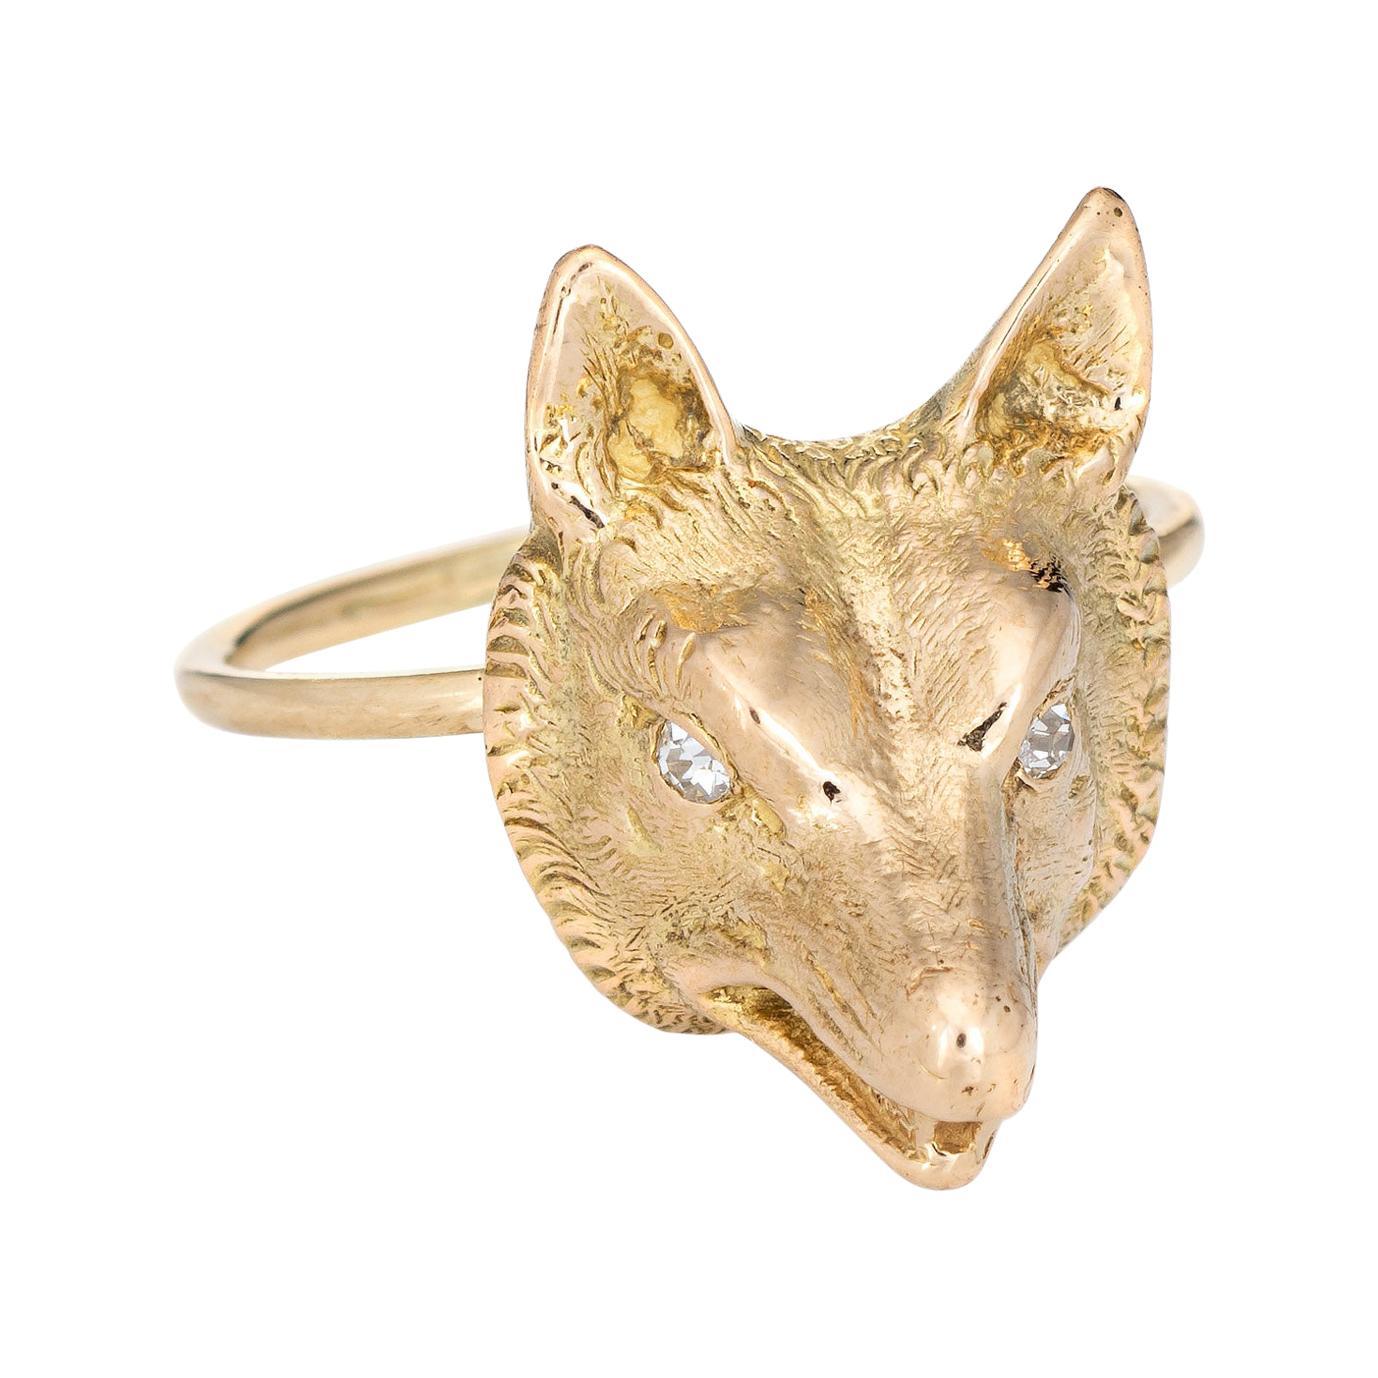 Antique Victorian Fox Conversion Ring 14k Gold Diamond Eyes Animal Jewelry